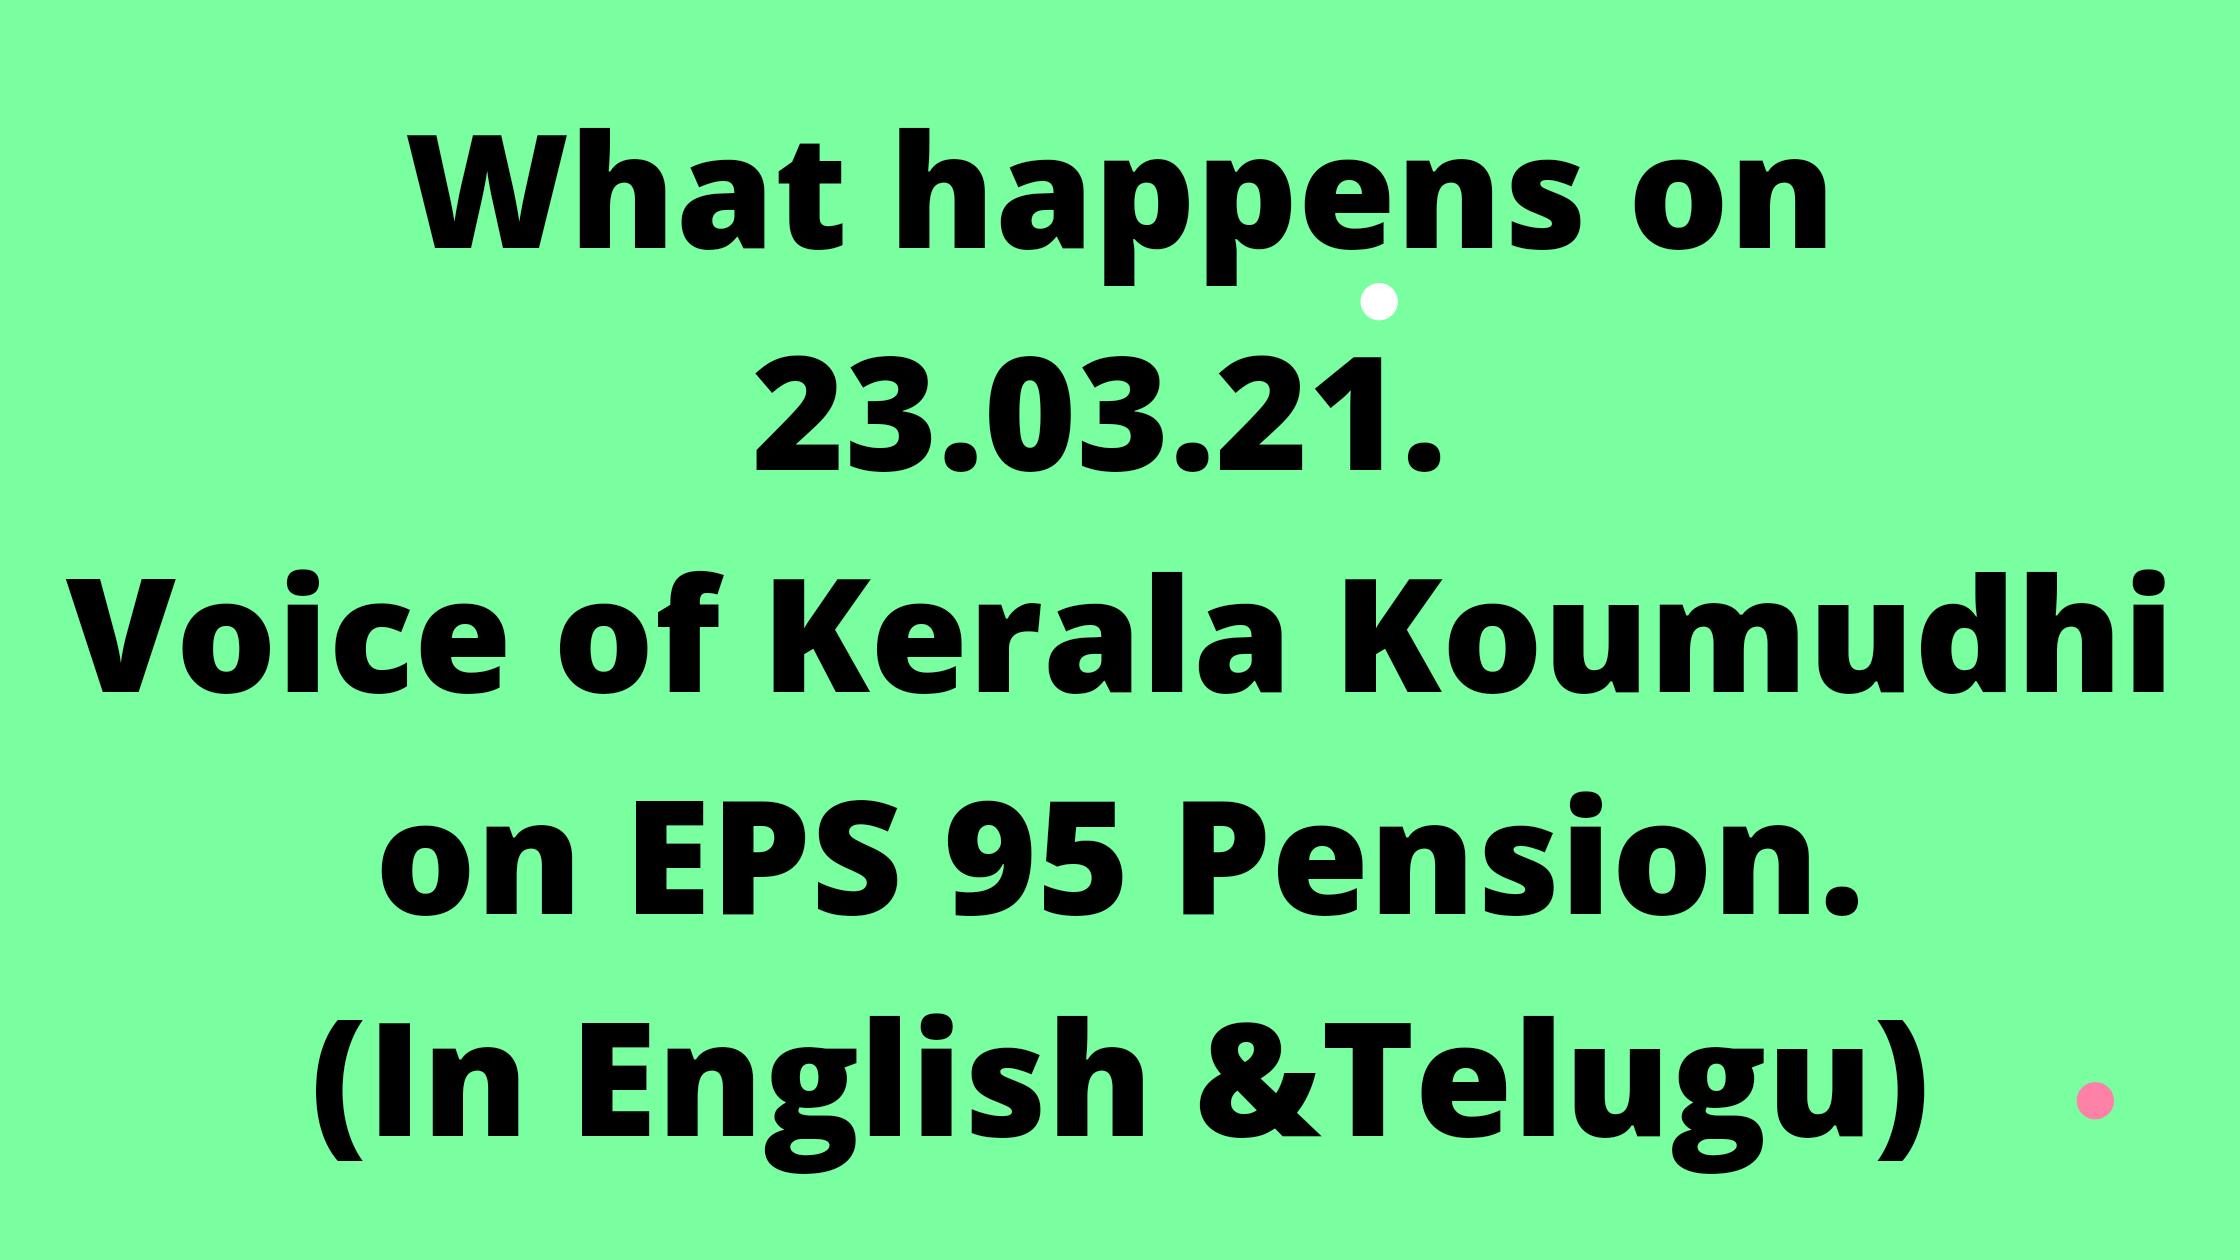 What happens on 23.03.21. Voice of Kerala Koumudhi on EPS 95 Pension.